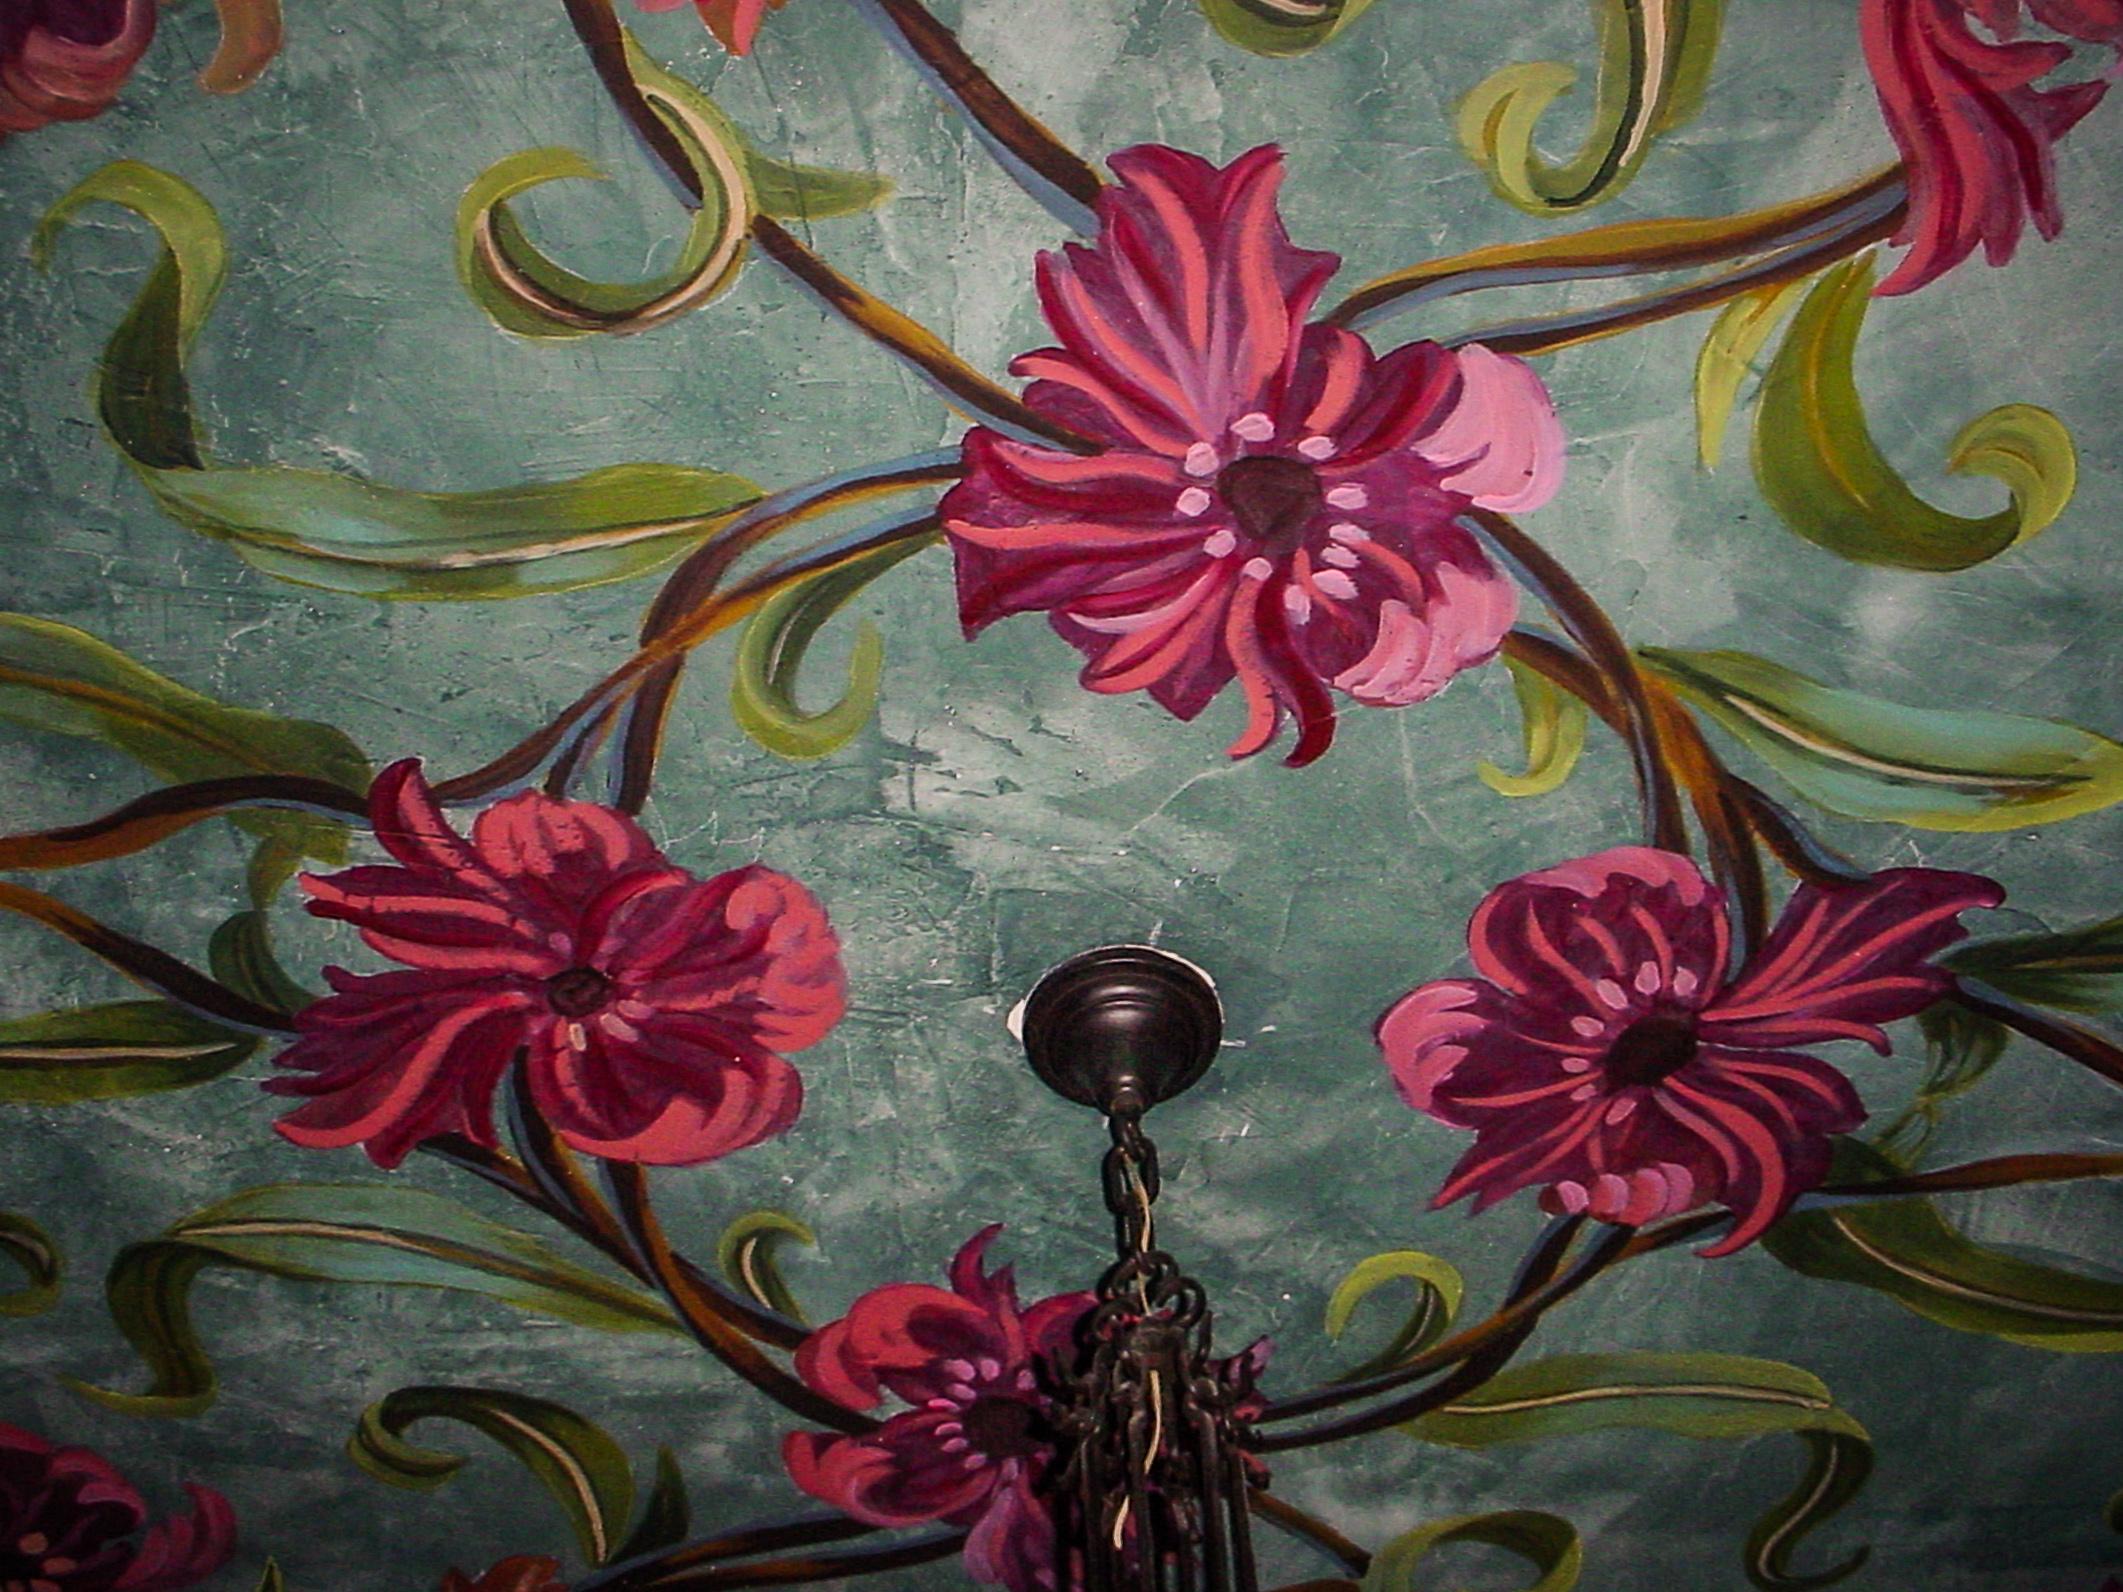 soldon_decorativepainting-2.jpg